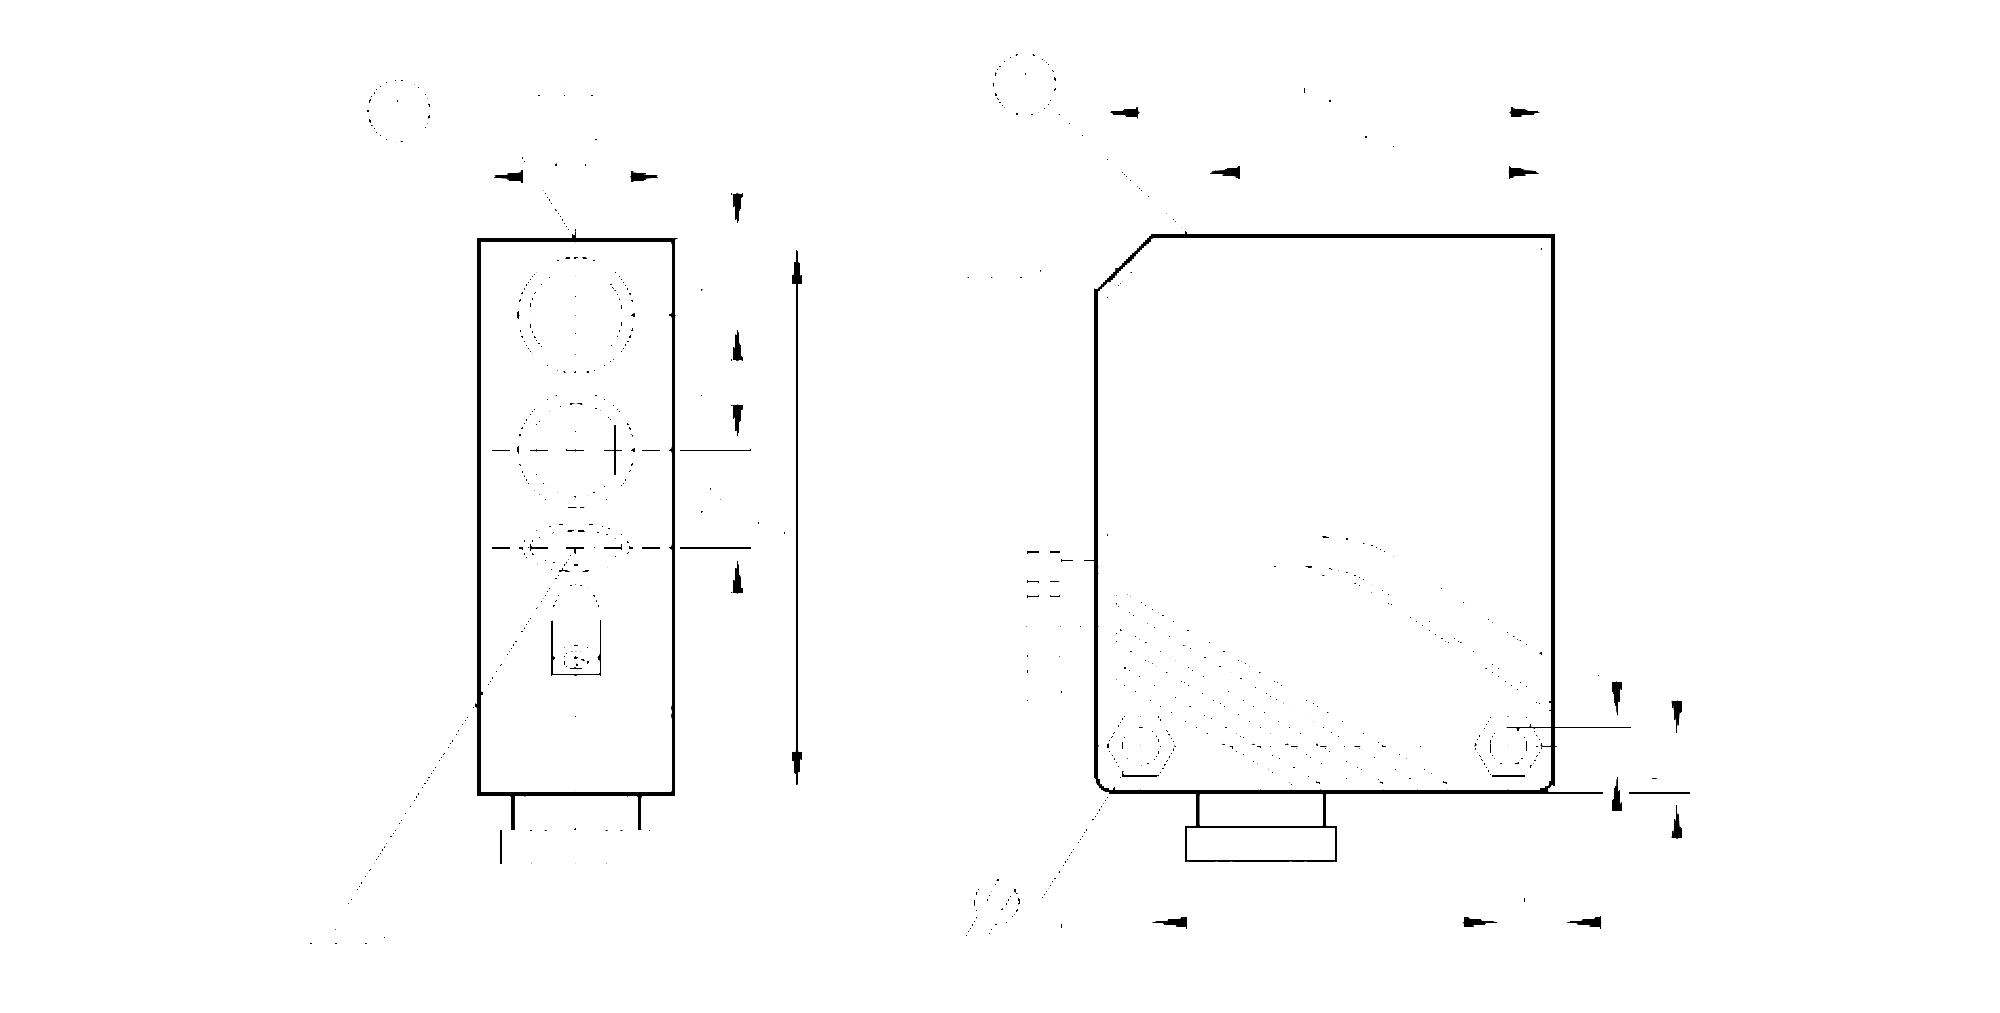 ol0004 - retro-reflective sensor